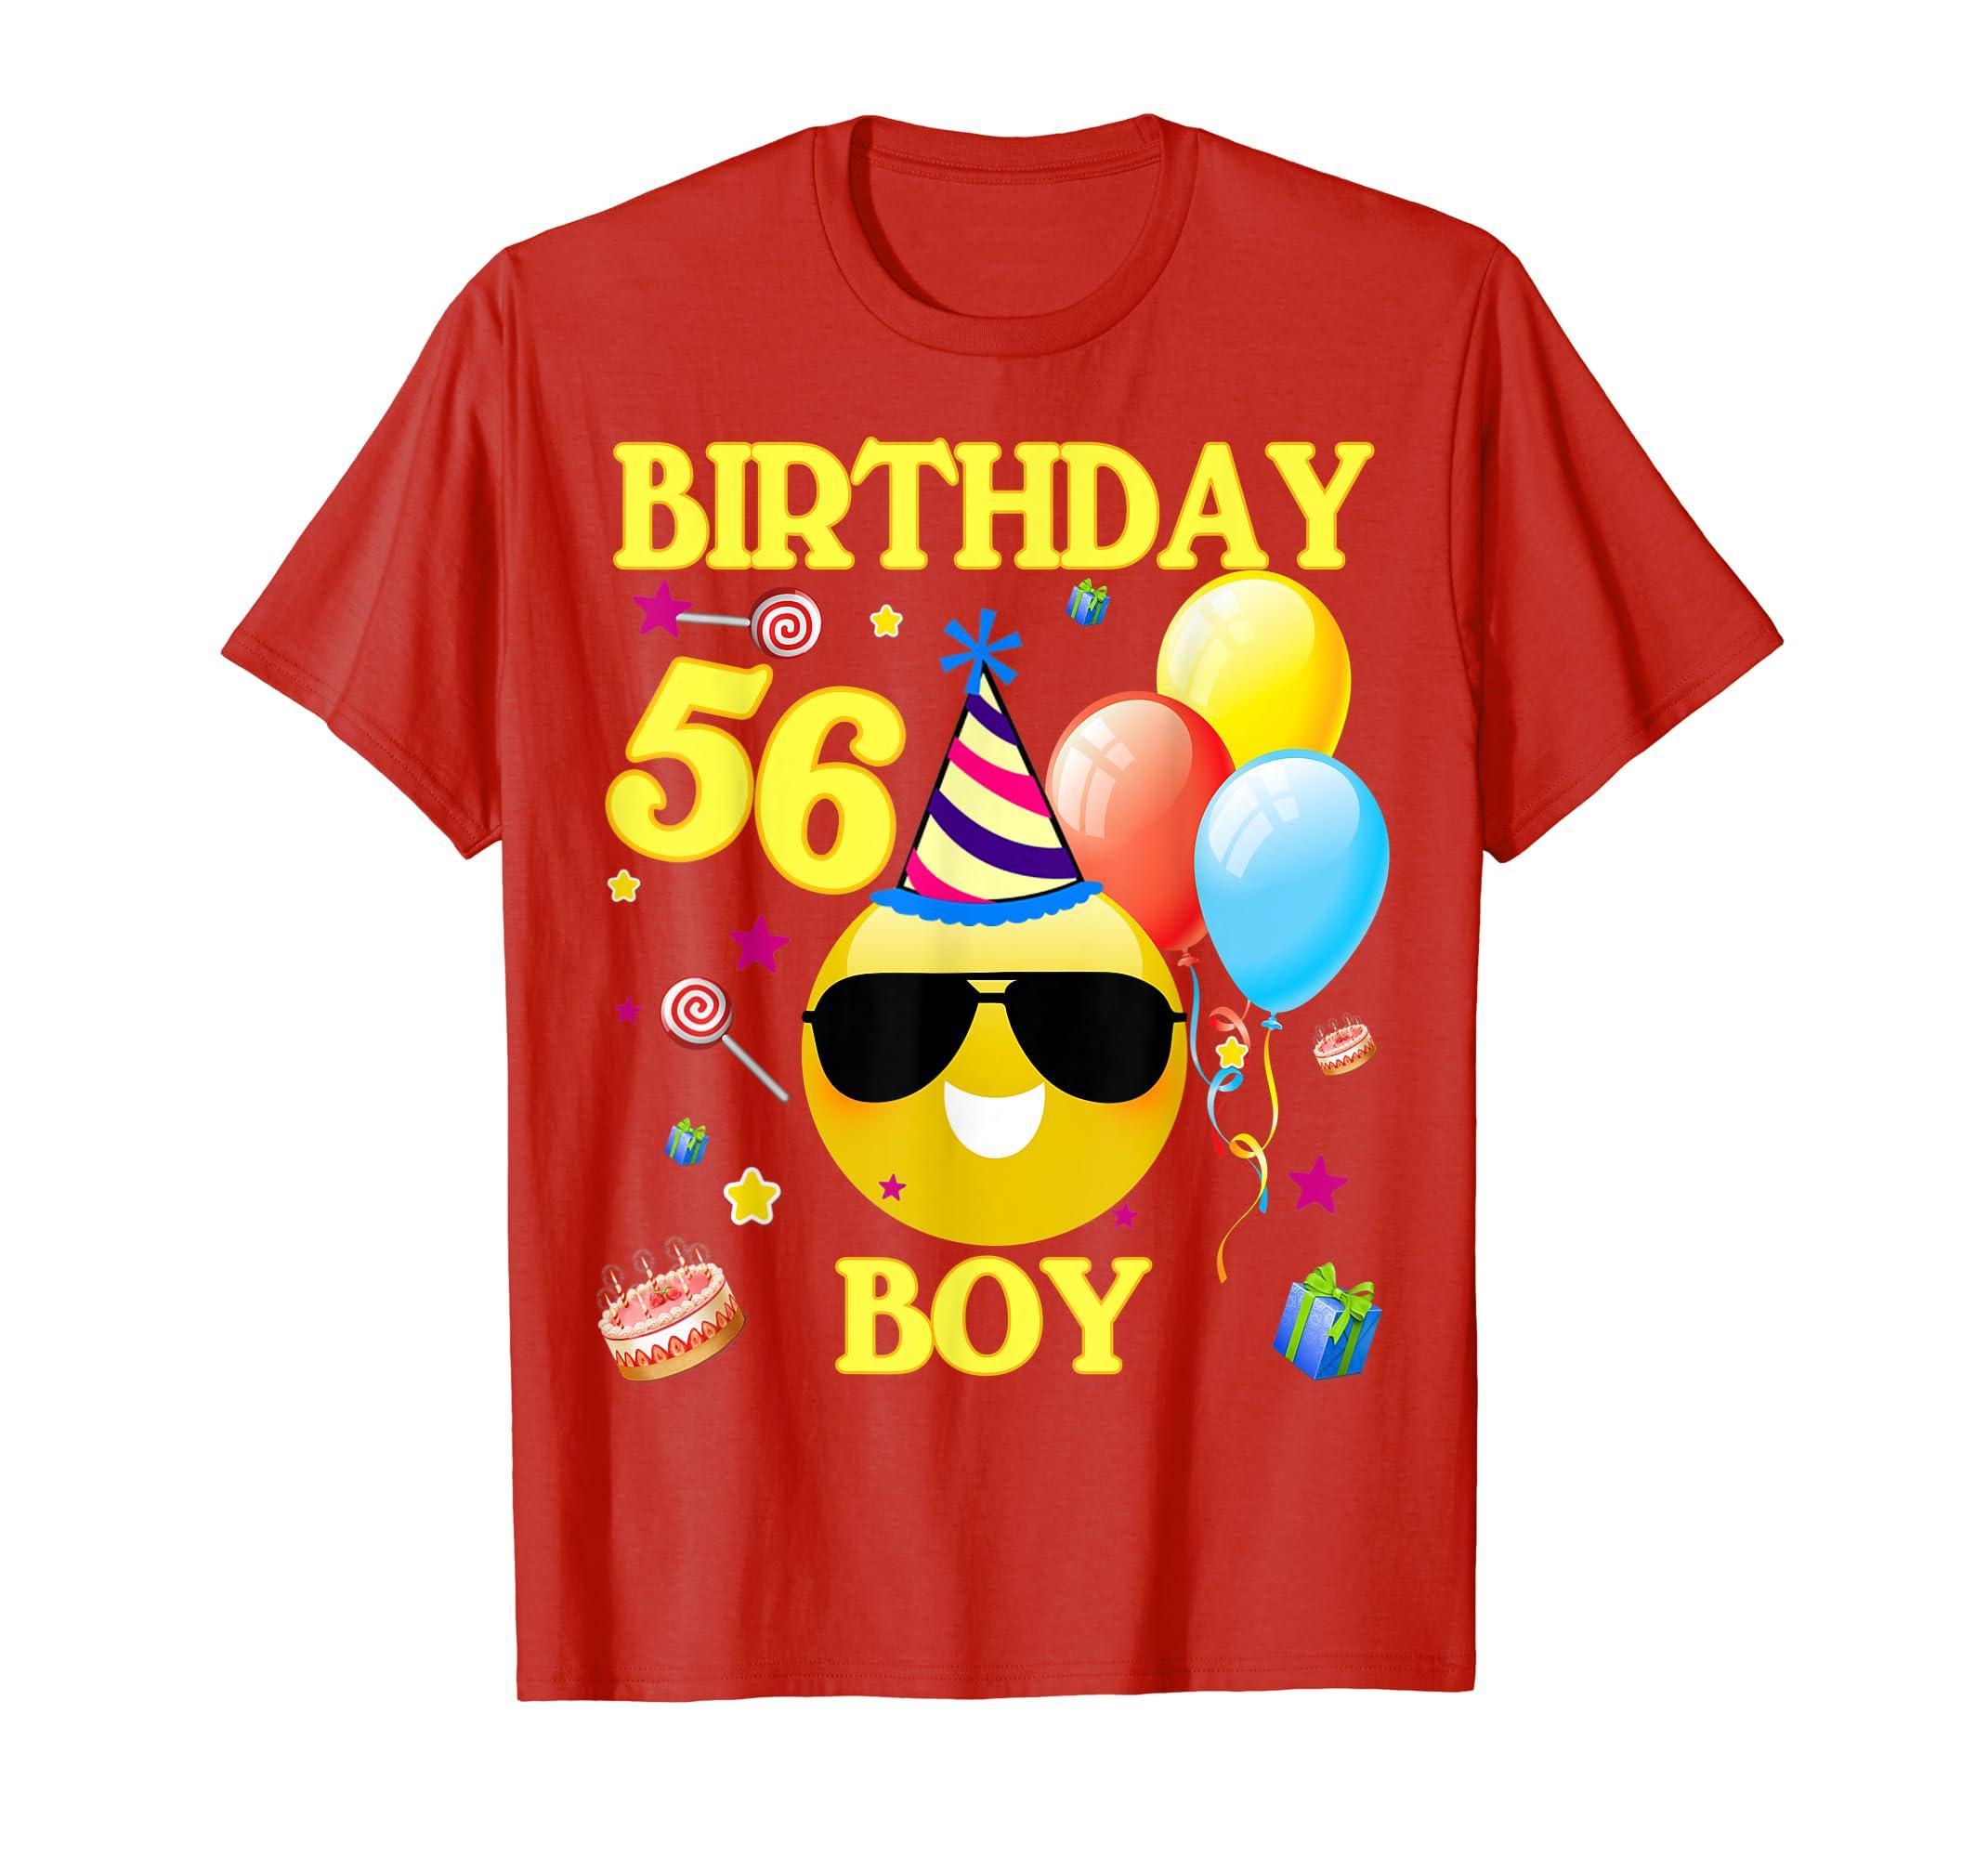 Amazon 56th Emoji Birthday Boy Shirt 56 Years Old Gifts A2 Clothing